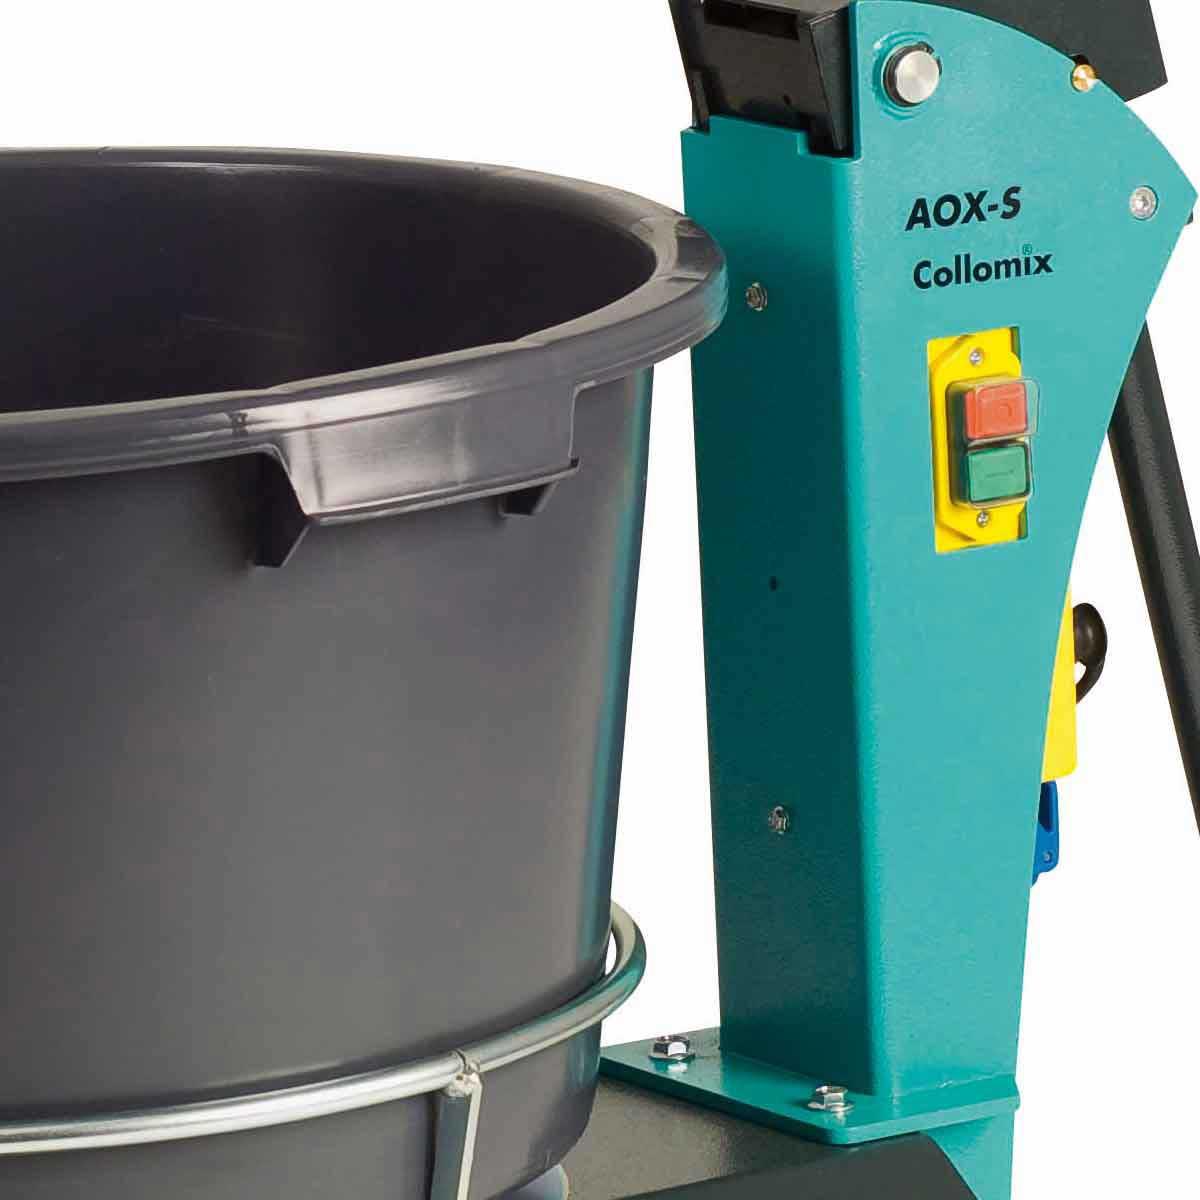 Collomix AOX-S bucket mixer switch